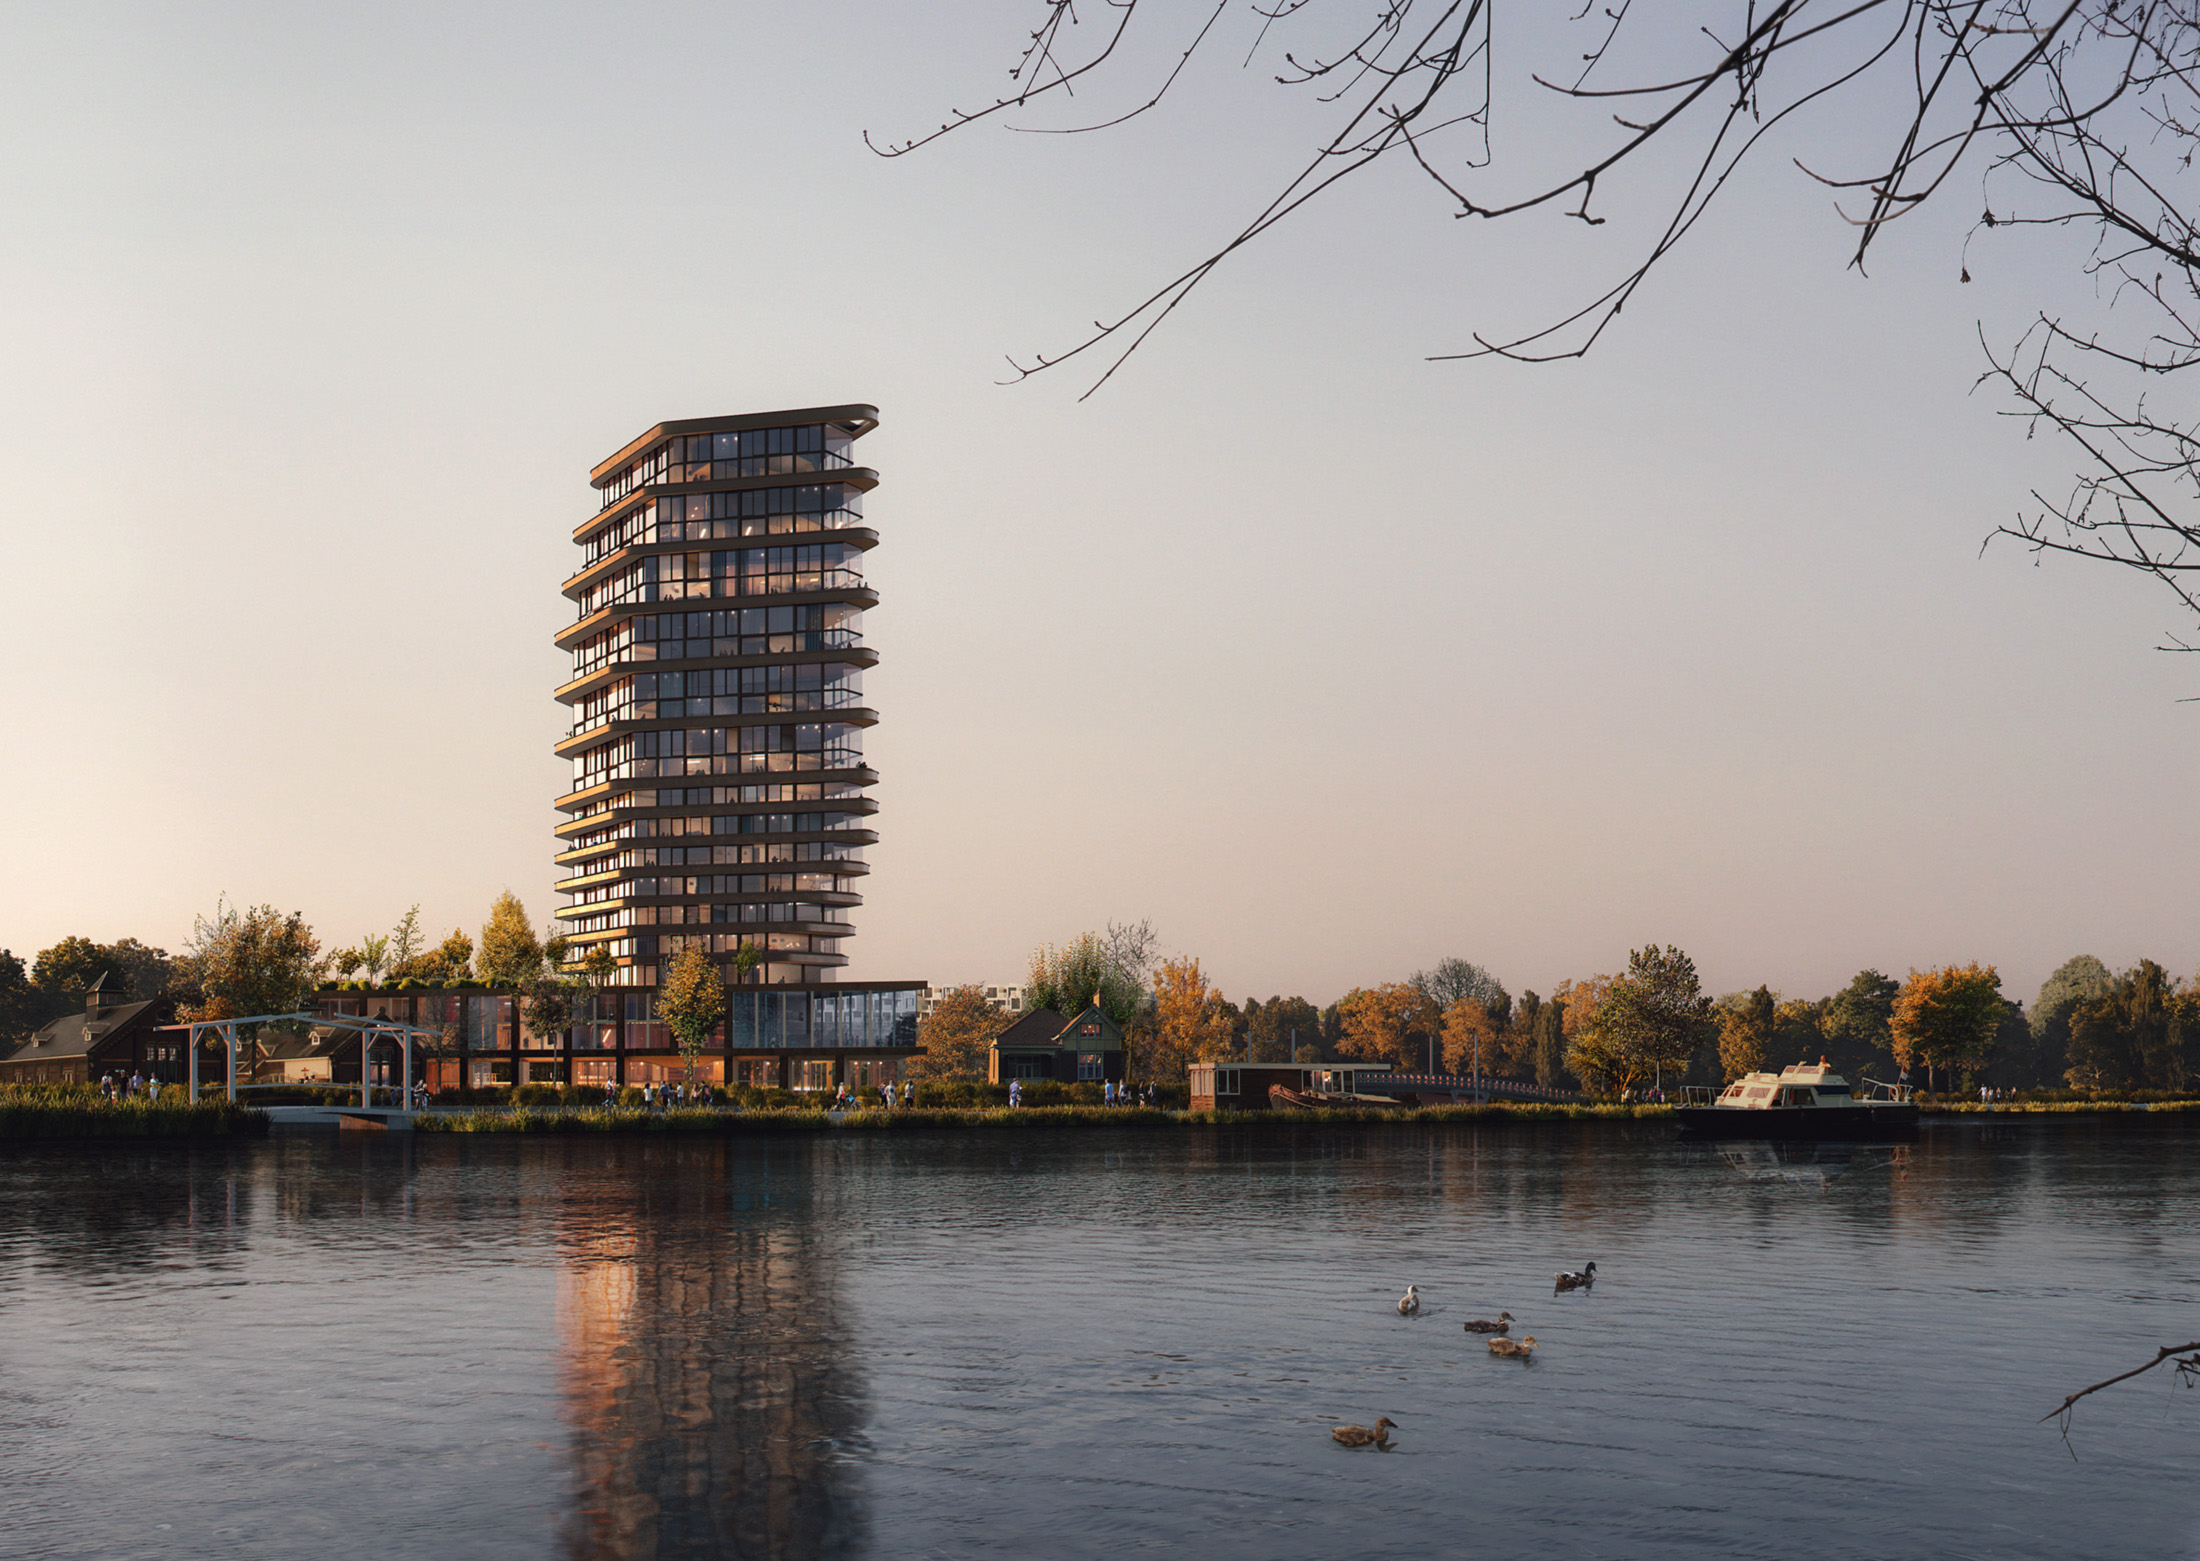 Tenderboost+Koschuch+Arup, Amstelkwartier, Netherlands, 2020